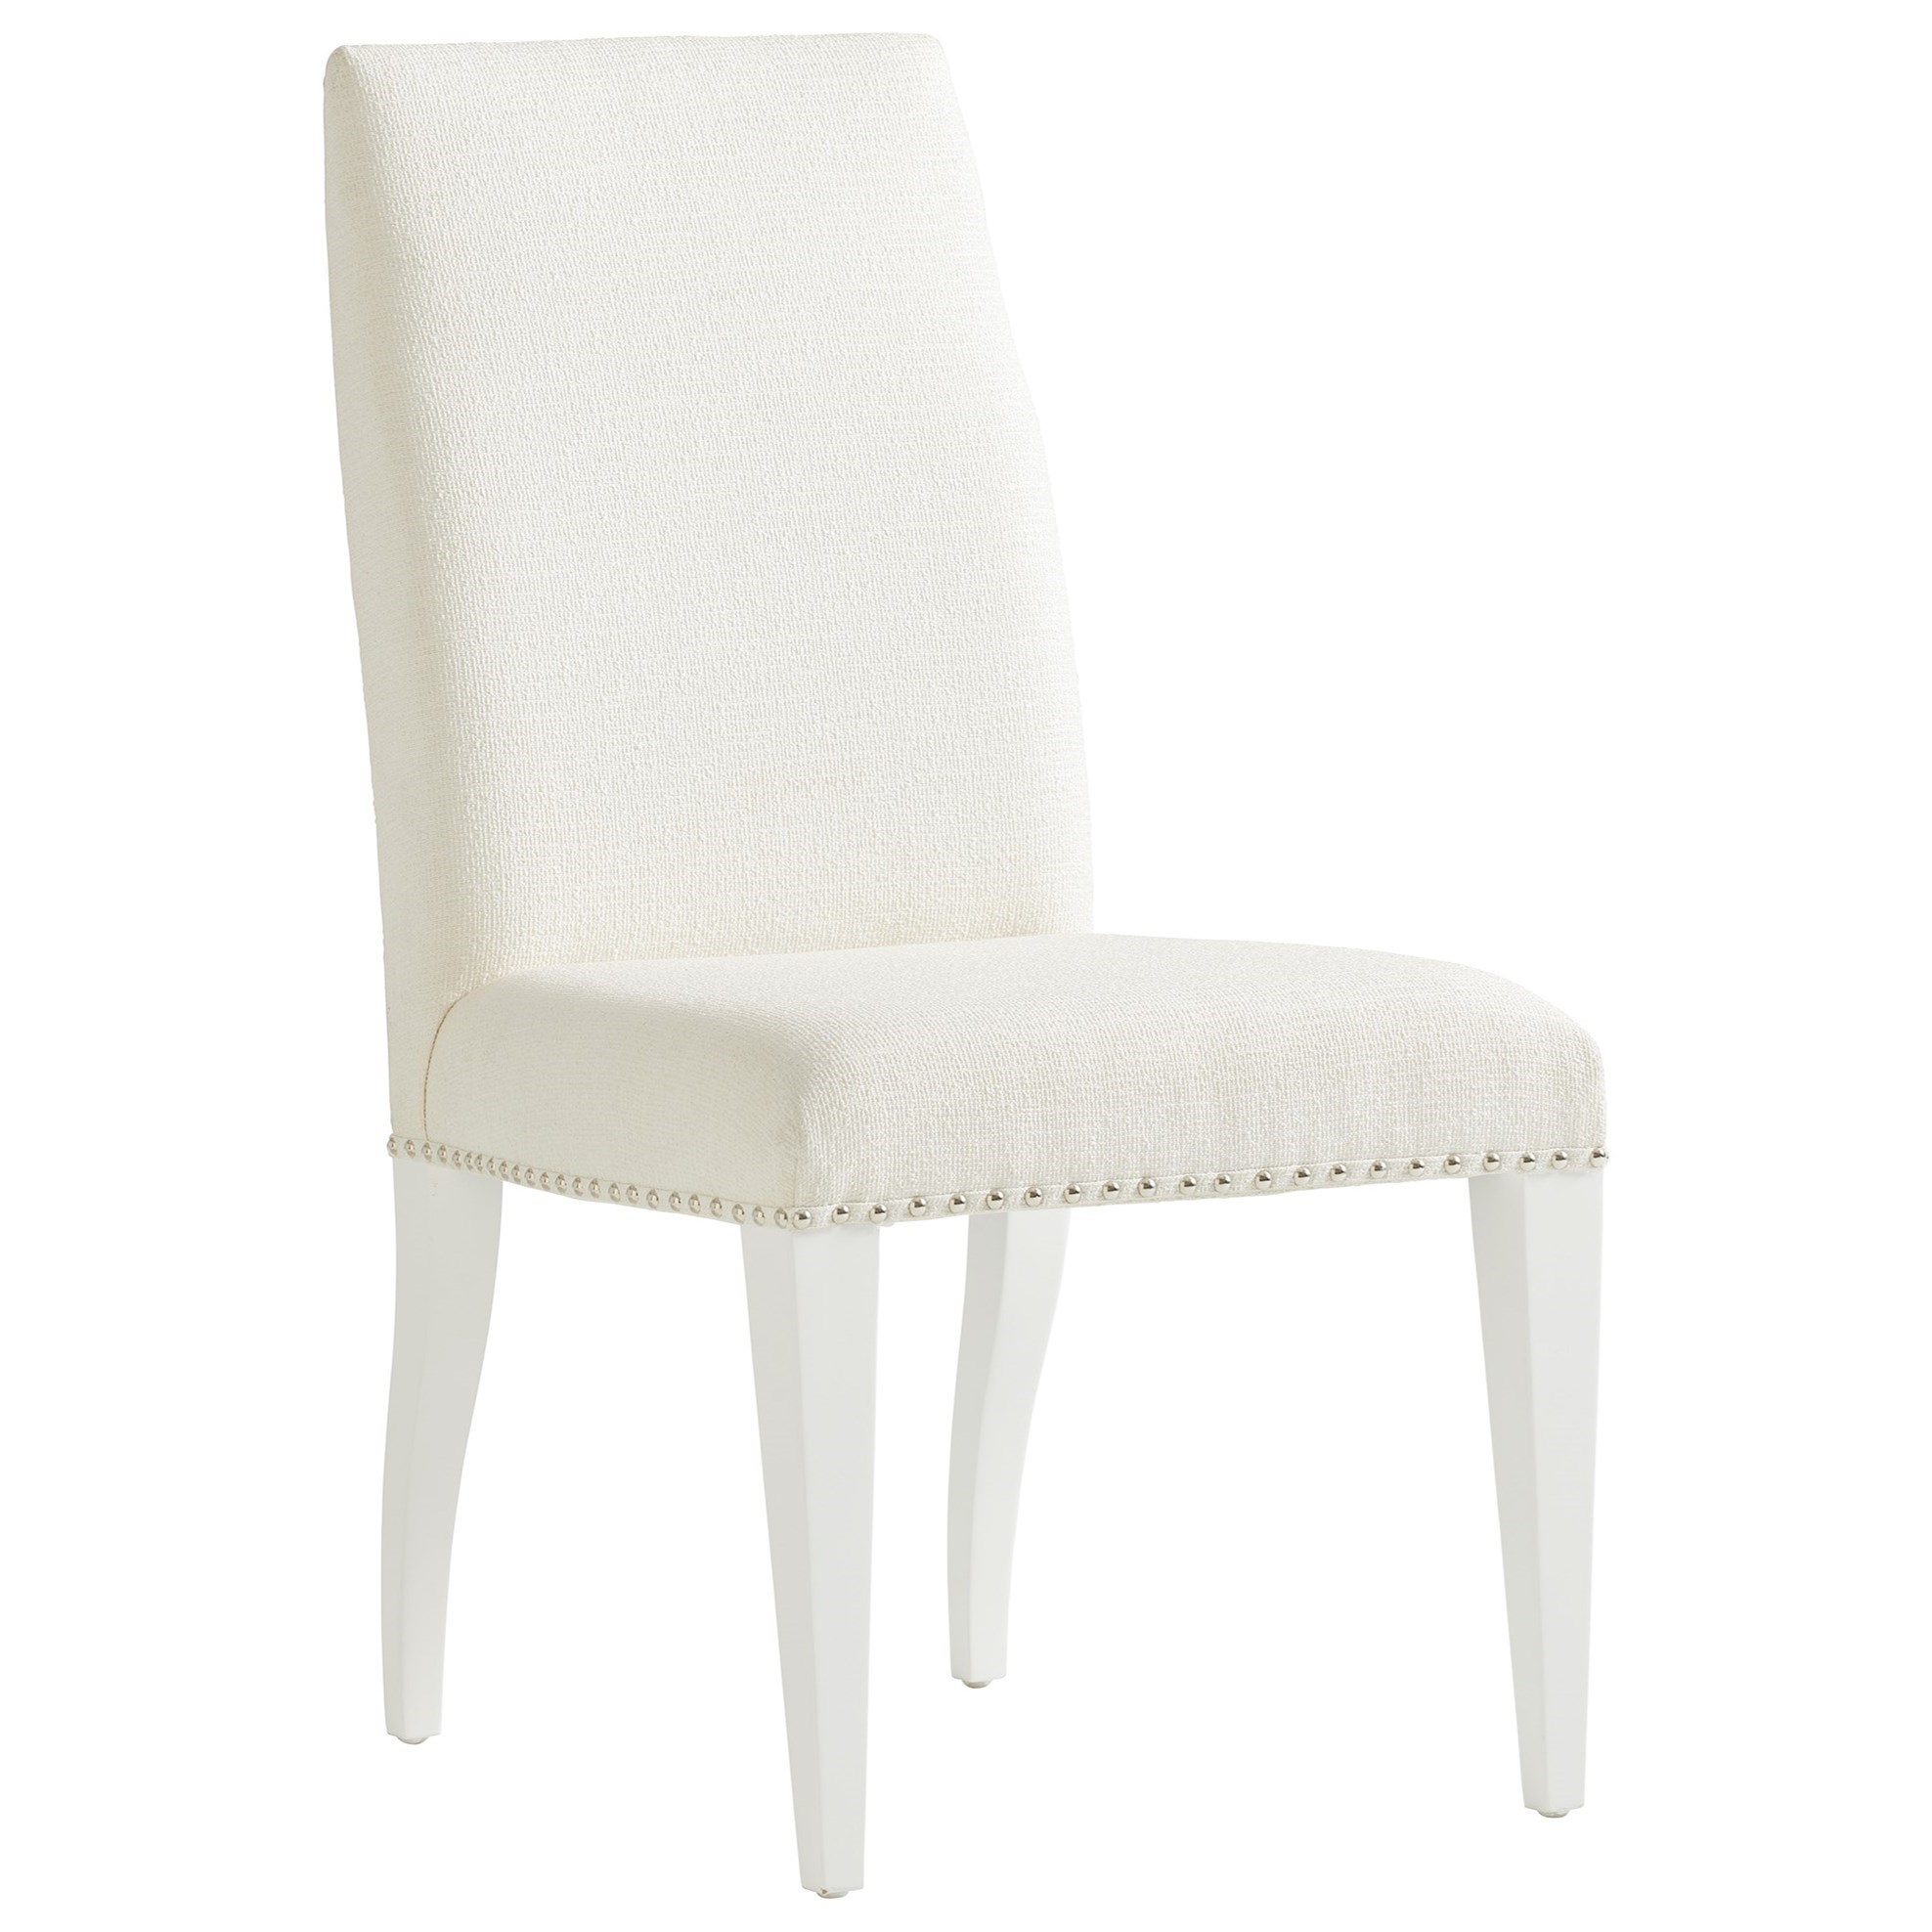 Avondale Darien Upholstered Side Chair by Lexington at Baer's Furniture